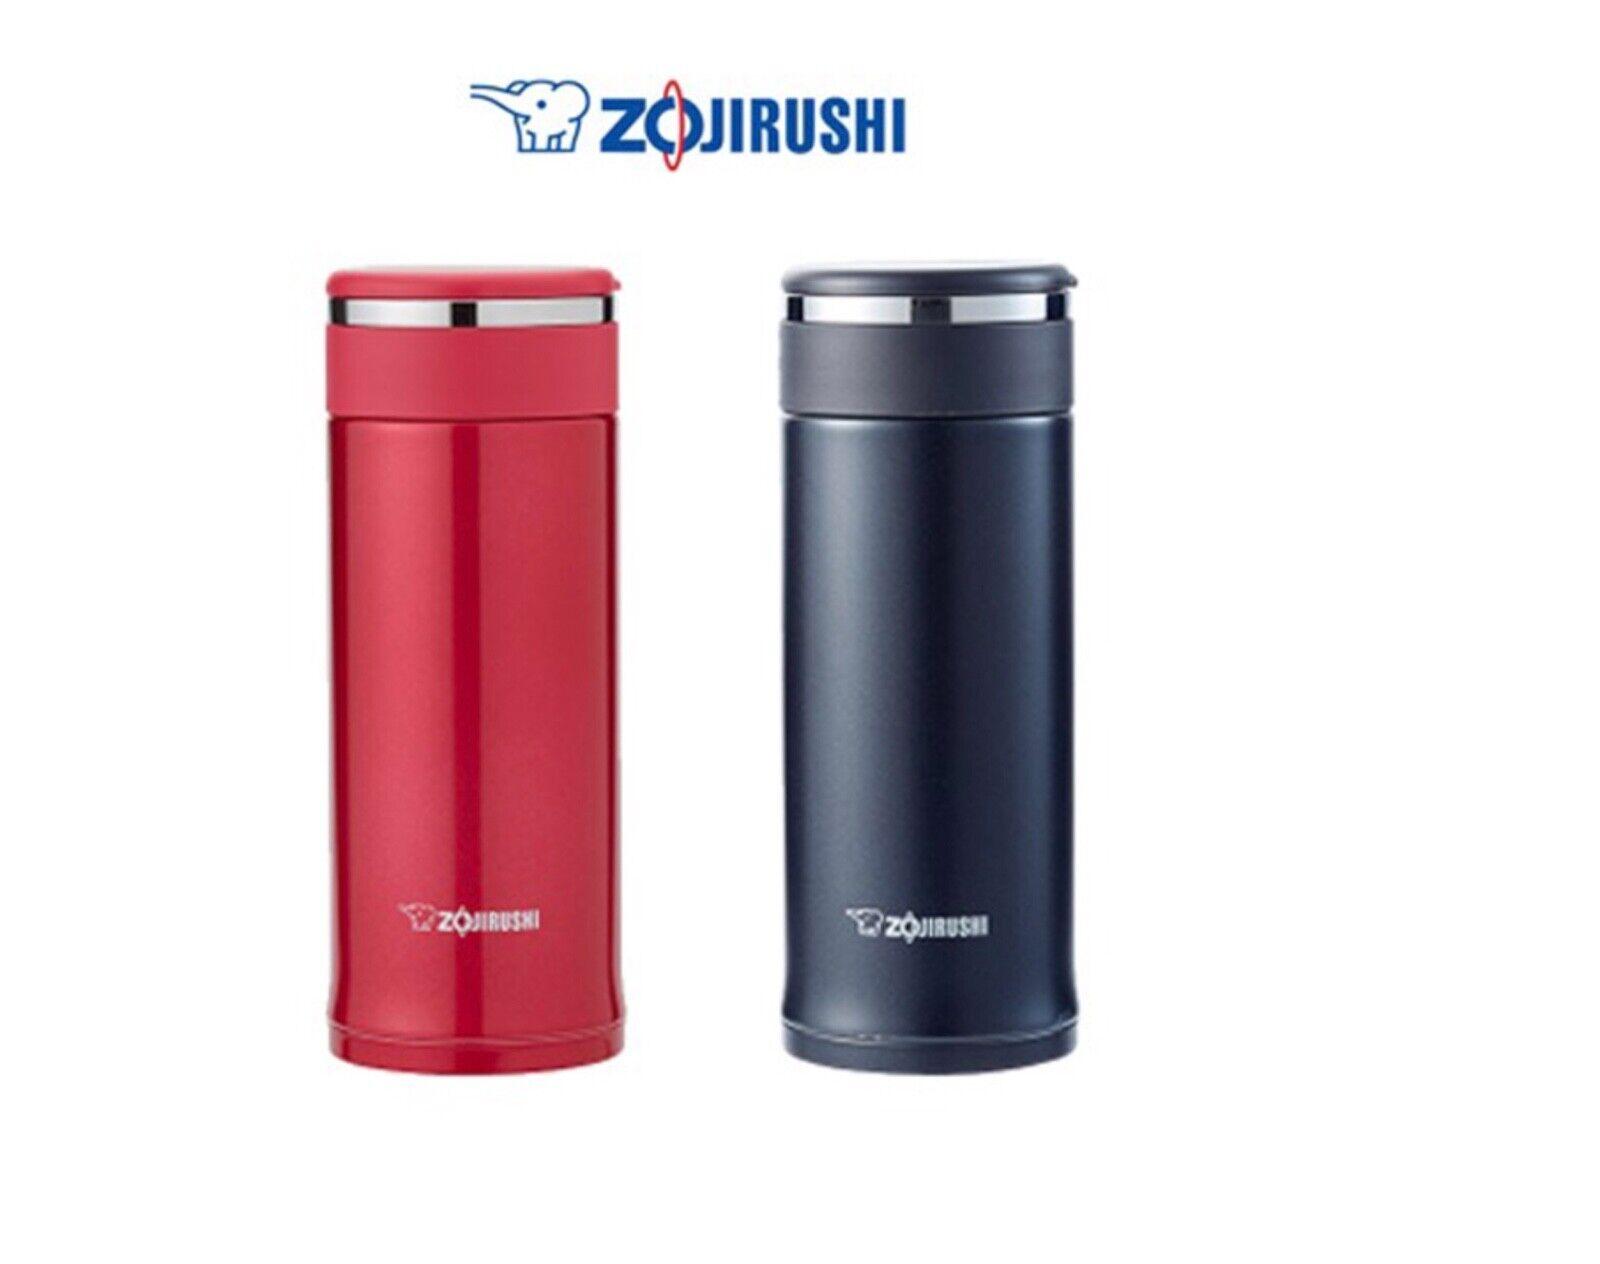 Zojirushi Thermos Stainless Vacuum Insulated Bottle 360ml 12